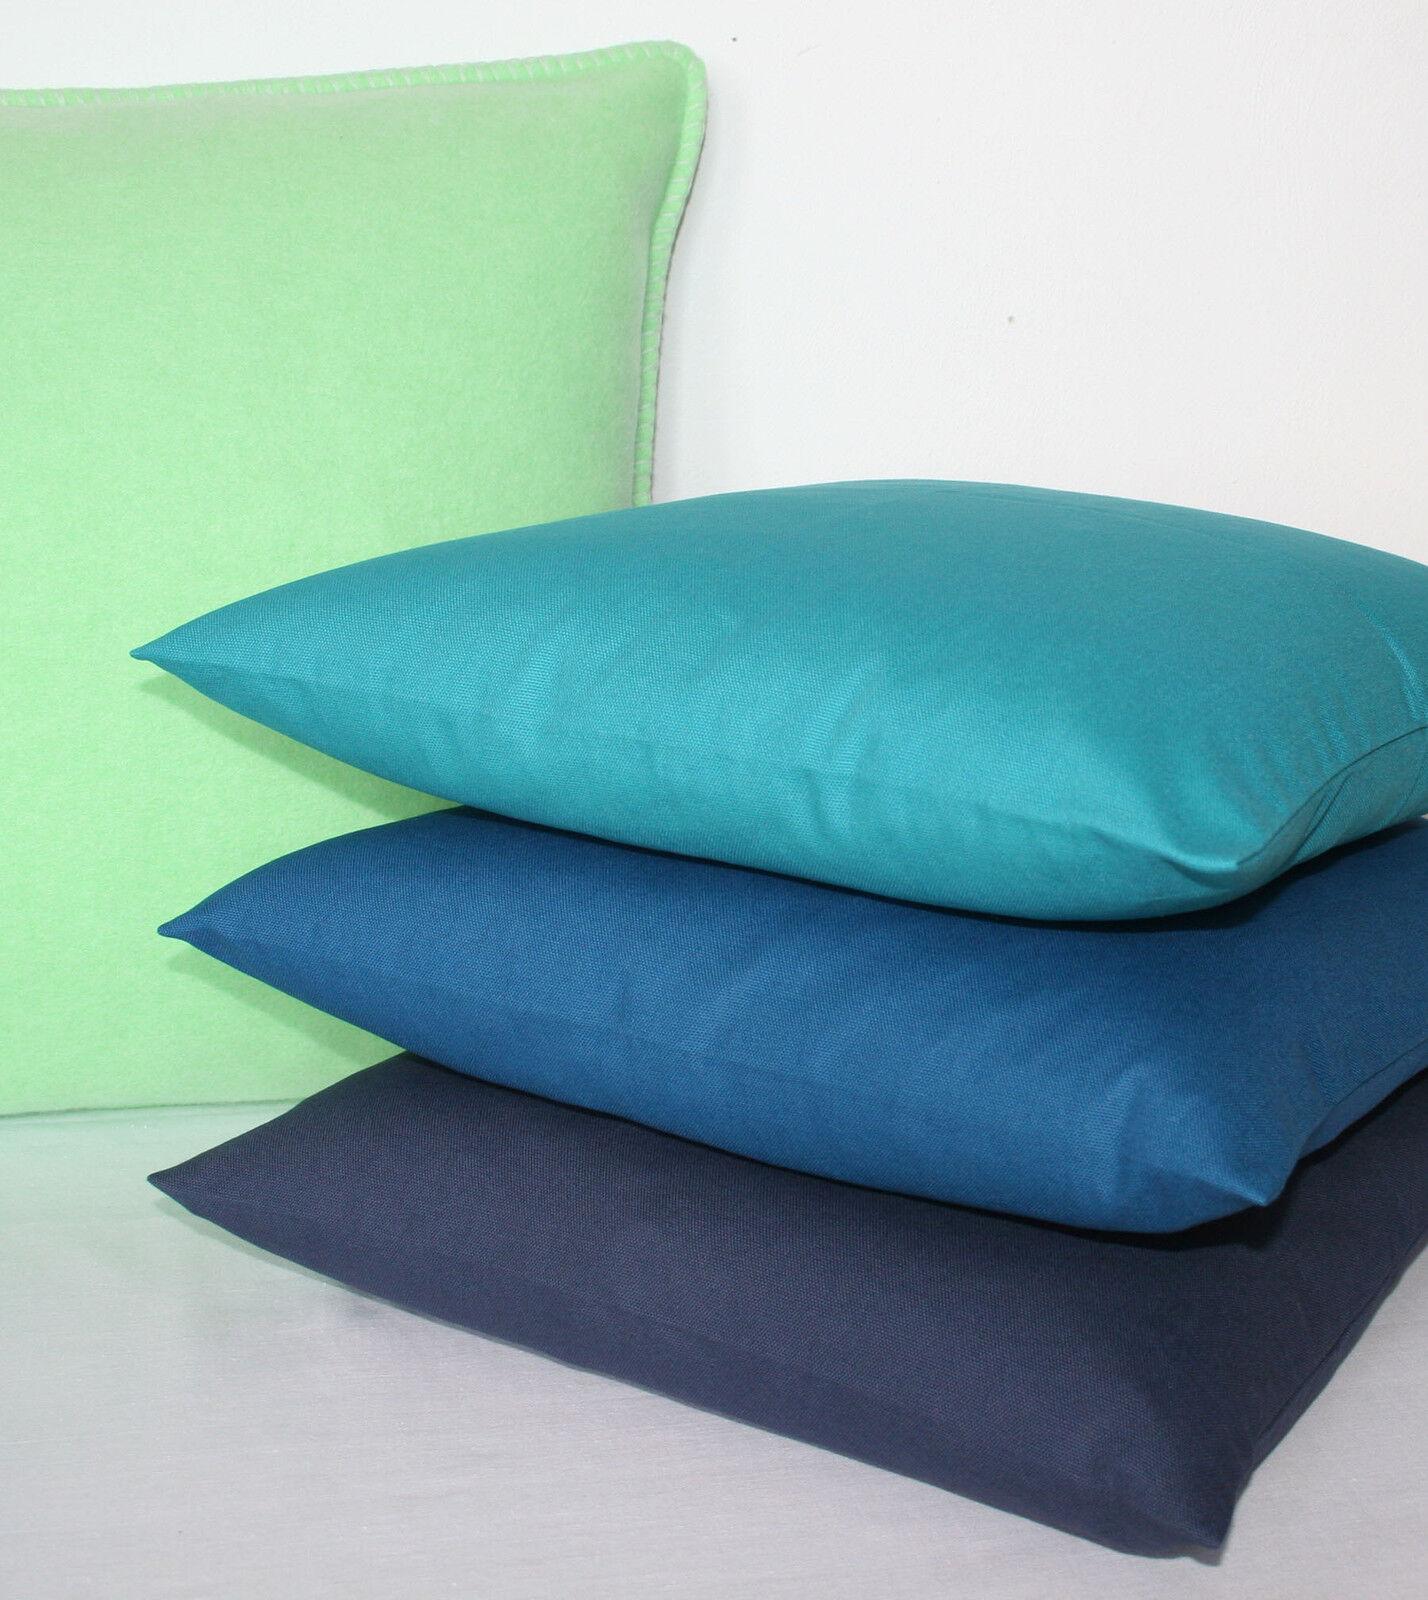 proflax kissen kissenh lle mira blau gr n 50x50 petrol. Black Bedroom Furniture Sets. Home Design Ideas